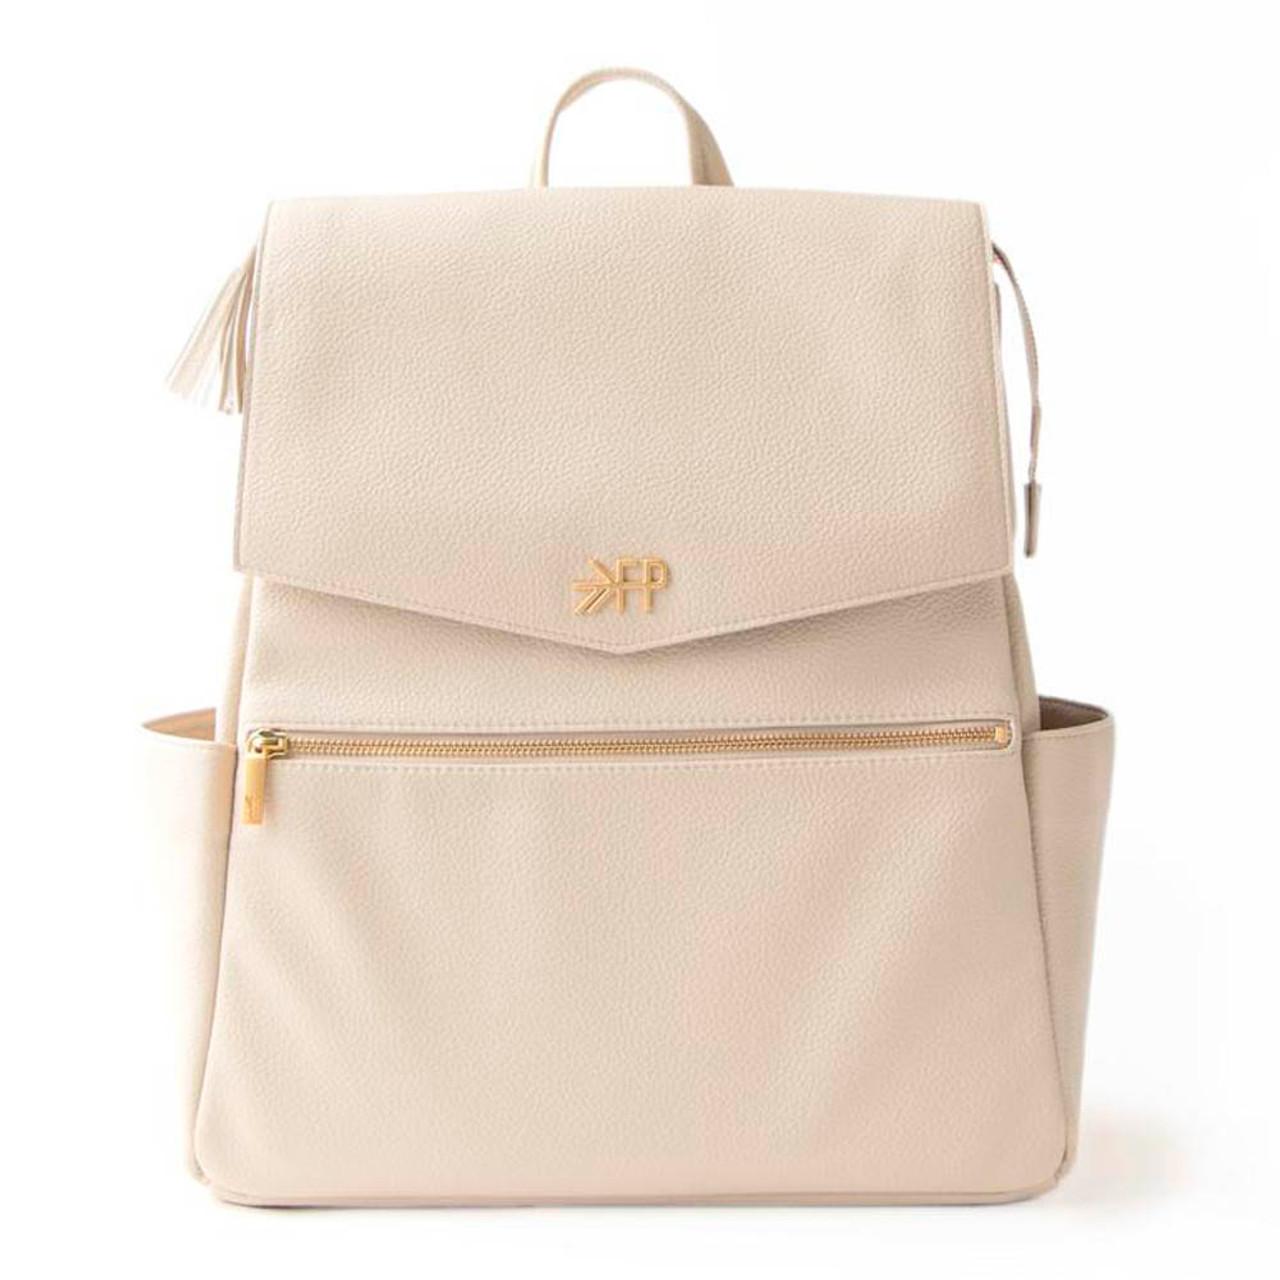 0c8970fd4a Freshly Picked Diaper Bag Backpack - Birch - Dear-Born Baby